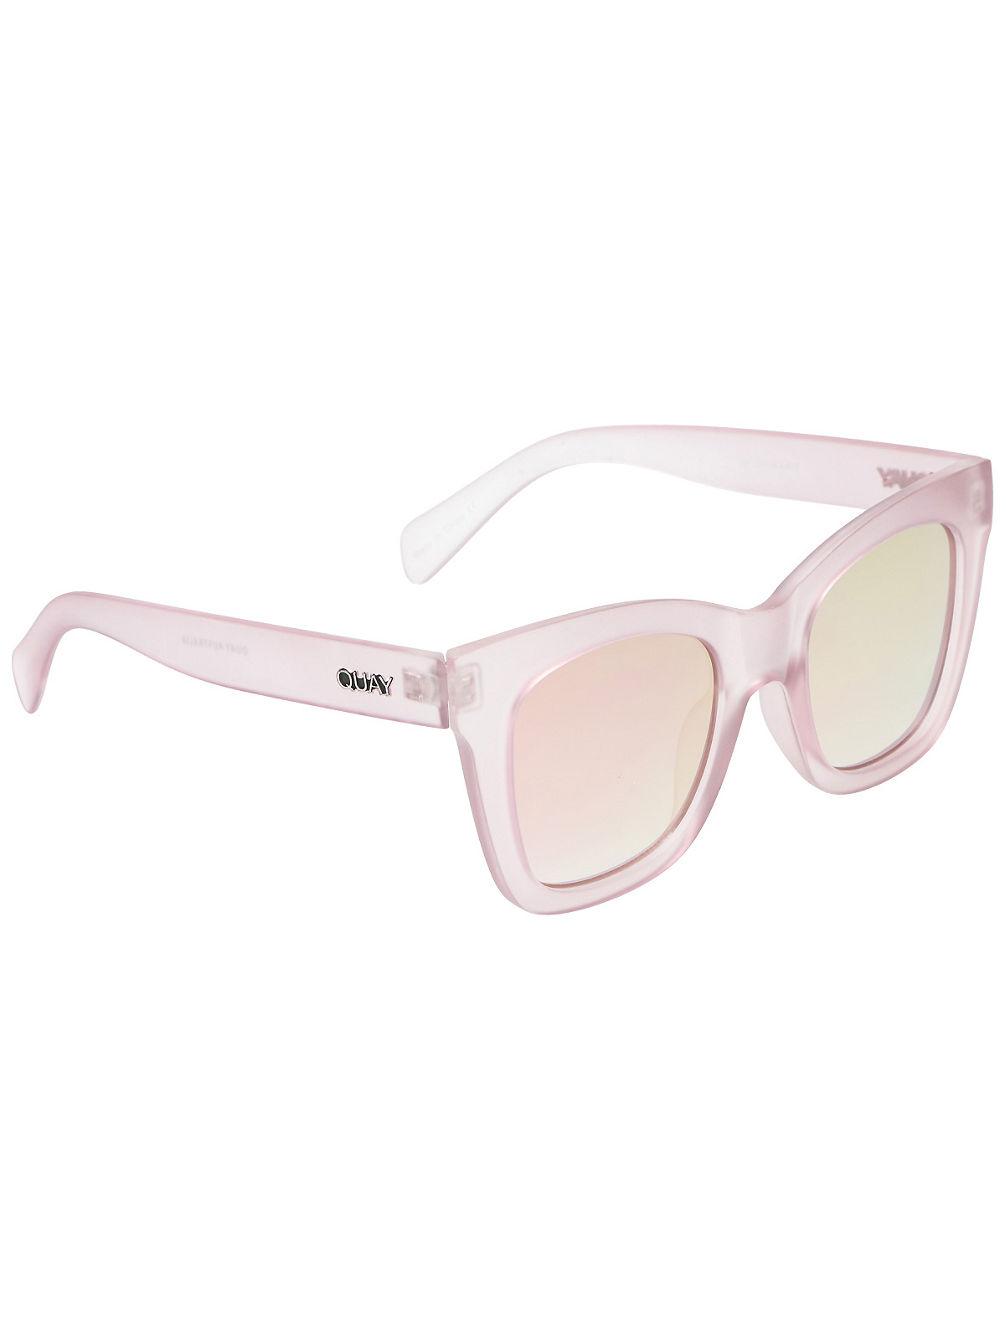 317c78d67d Quay Australia After Hours Pink Sonnenbrille online kaufen bei Blue Tomato